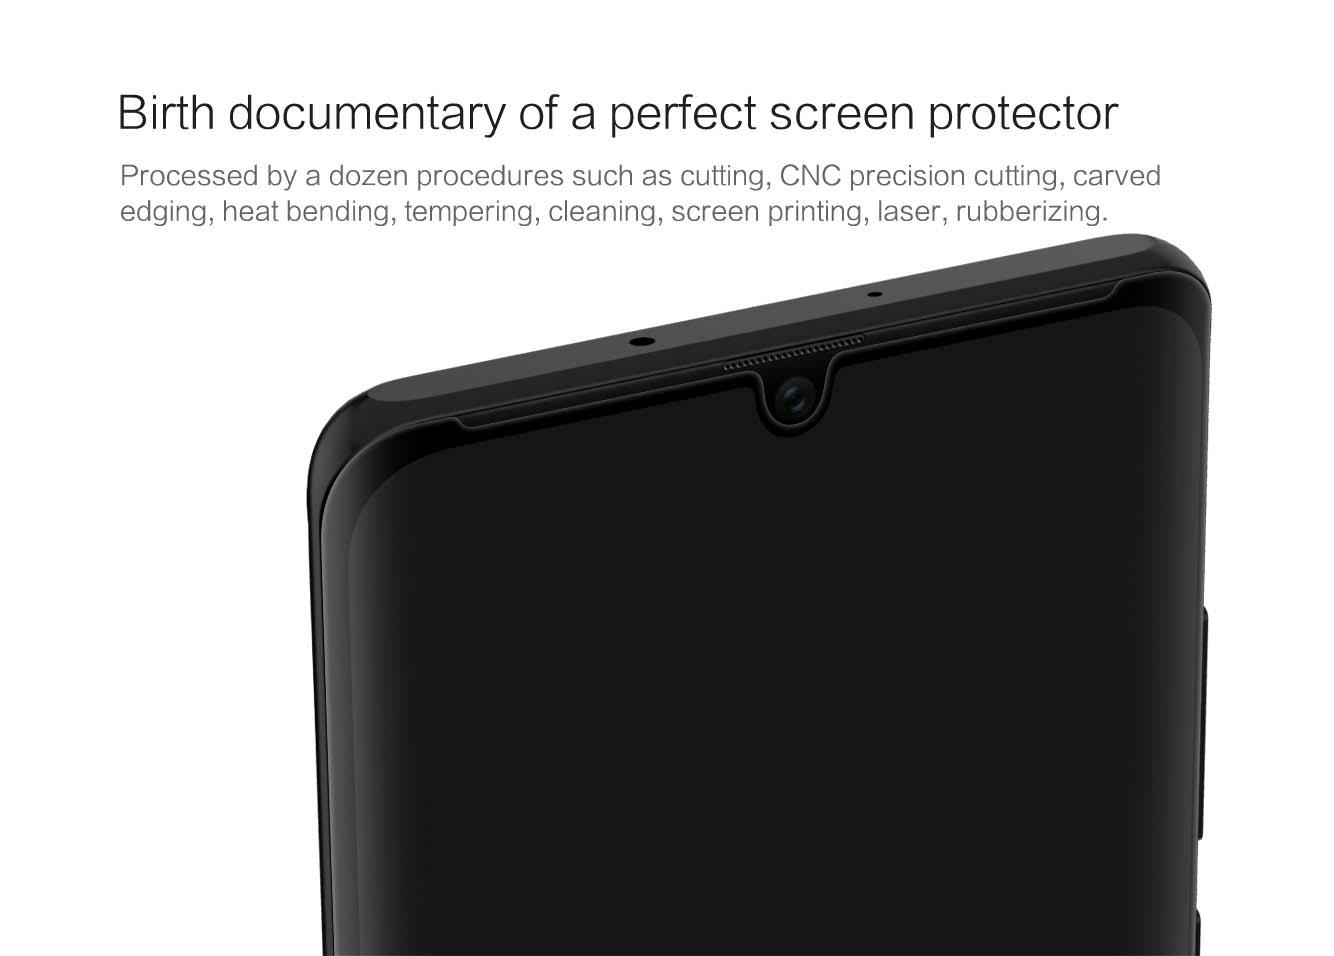 HUAWEI P30 Pro screen protector